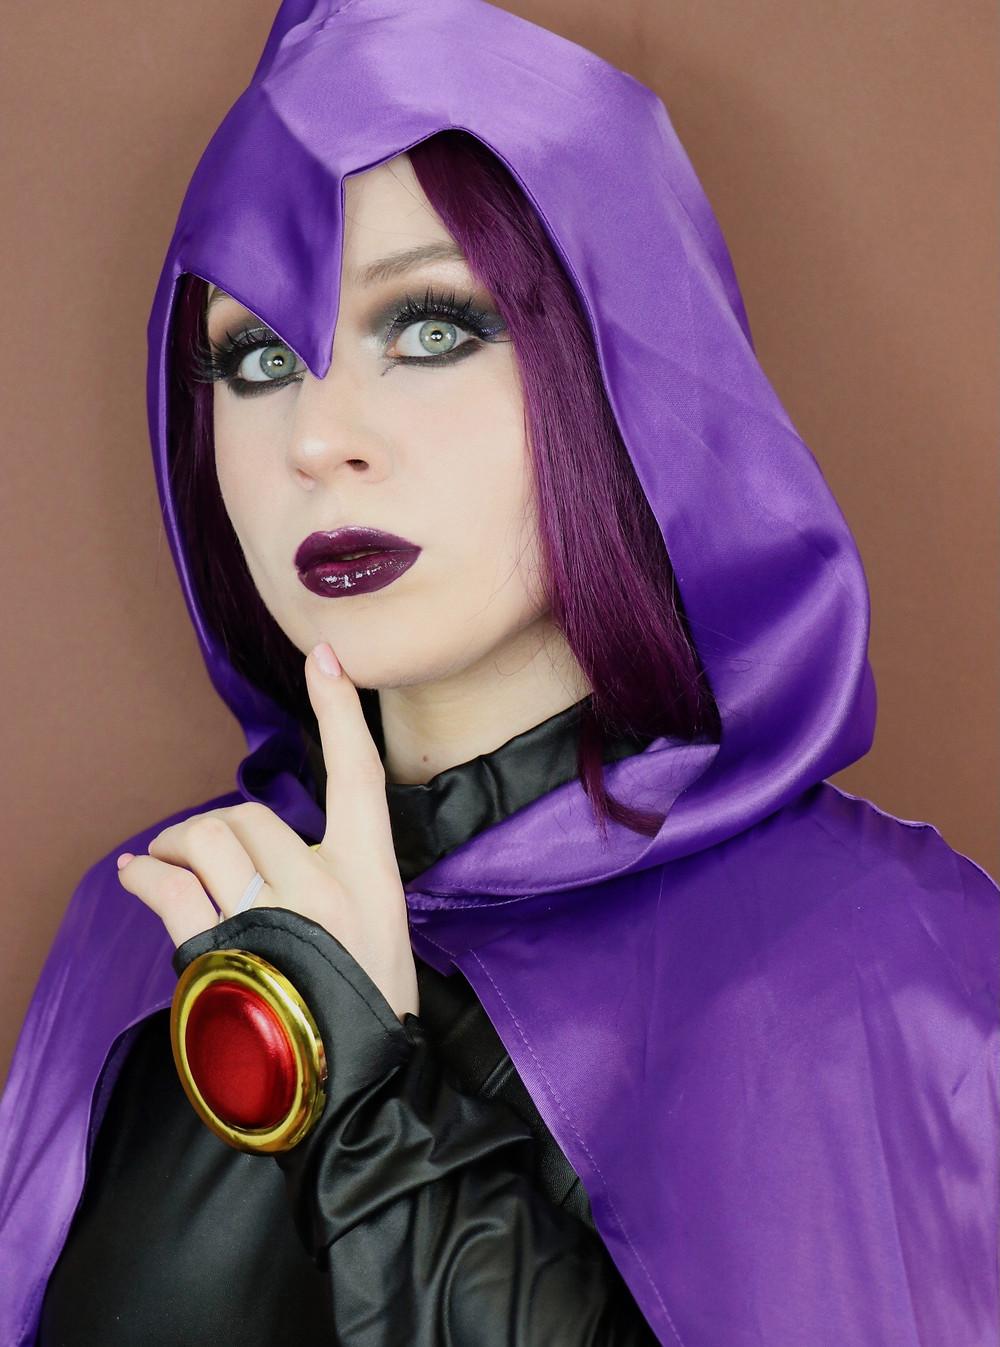 Teen Titans Raven Makeup Tutorial DC Comics Cosplay 2020 | Lillee Jean